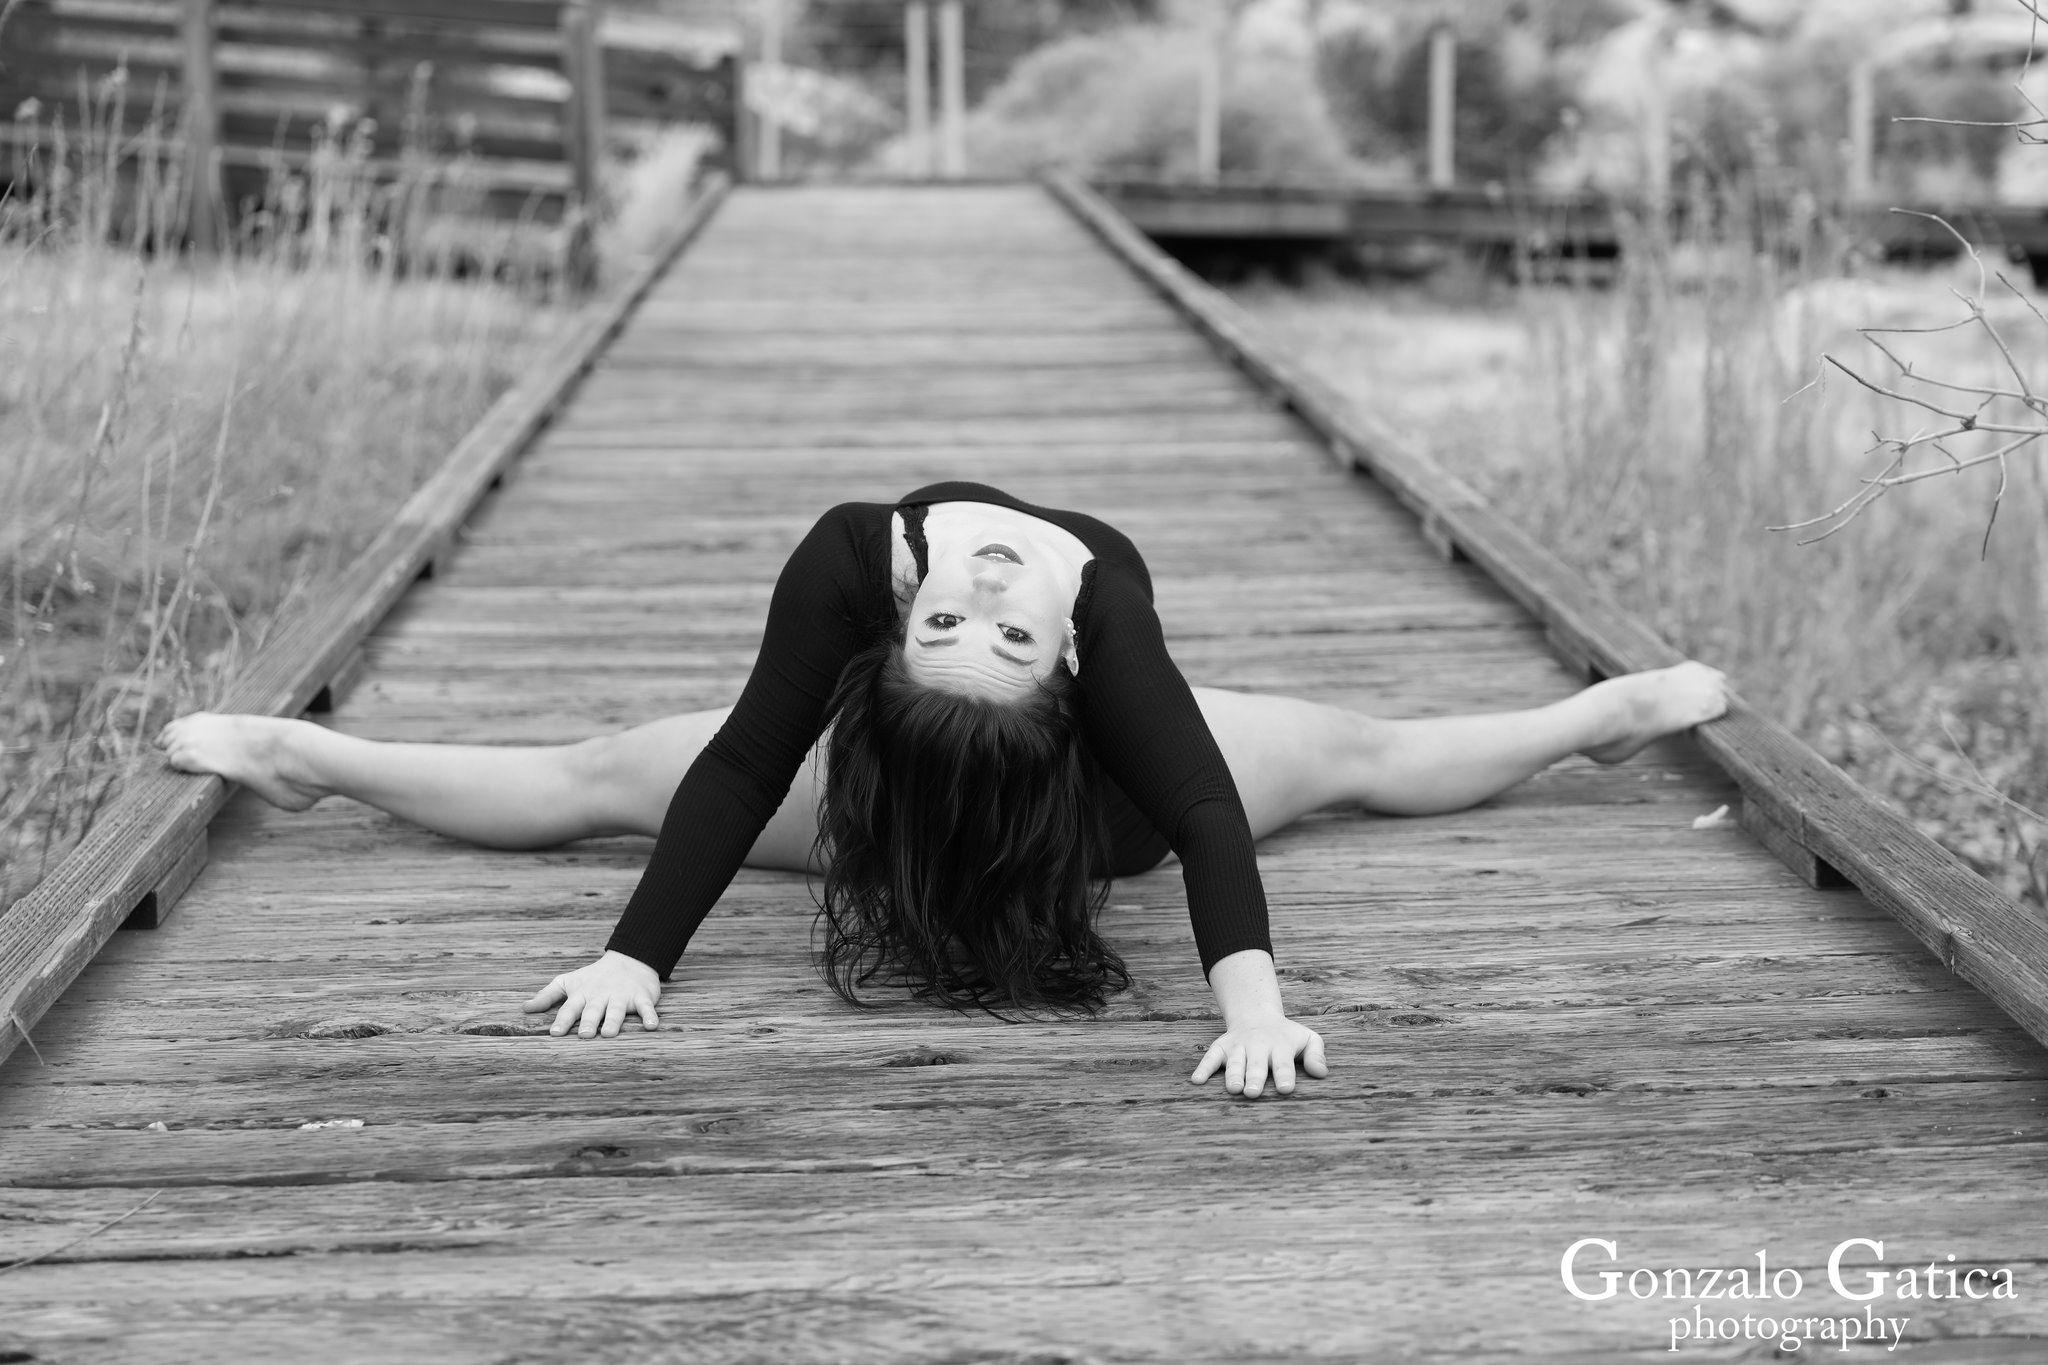 https://flic.kr/p/S7o5Jz | Hattie Burton | #HattieBurton #Dancer #LasVegas #Vegas #CalicoBasin #BAndW #Photogaphy #GonzaloGaticaPhotography #Bailarina #Canon5DMarkIV